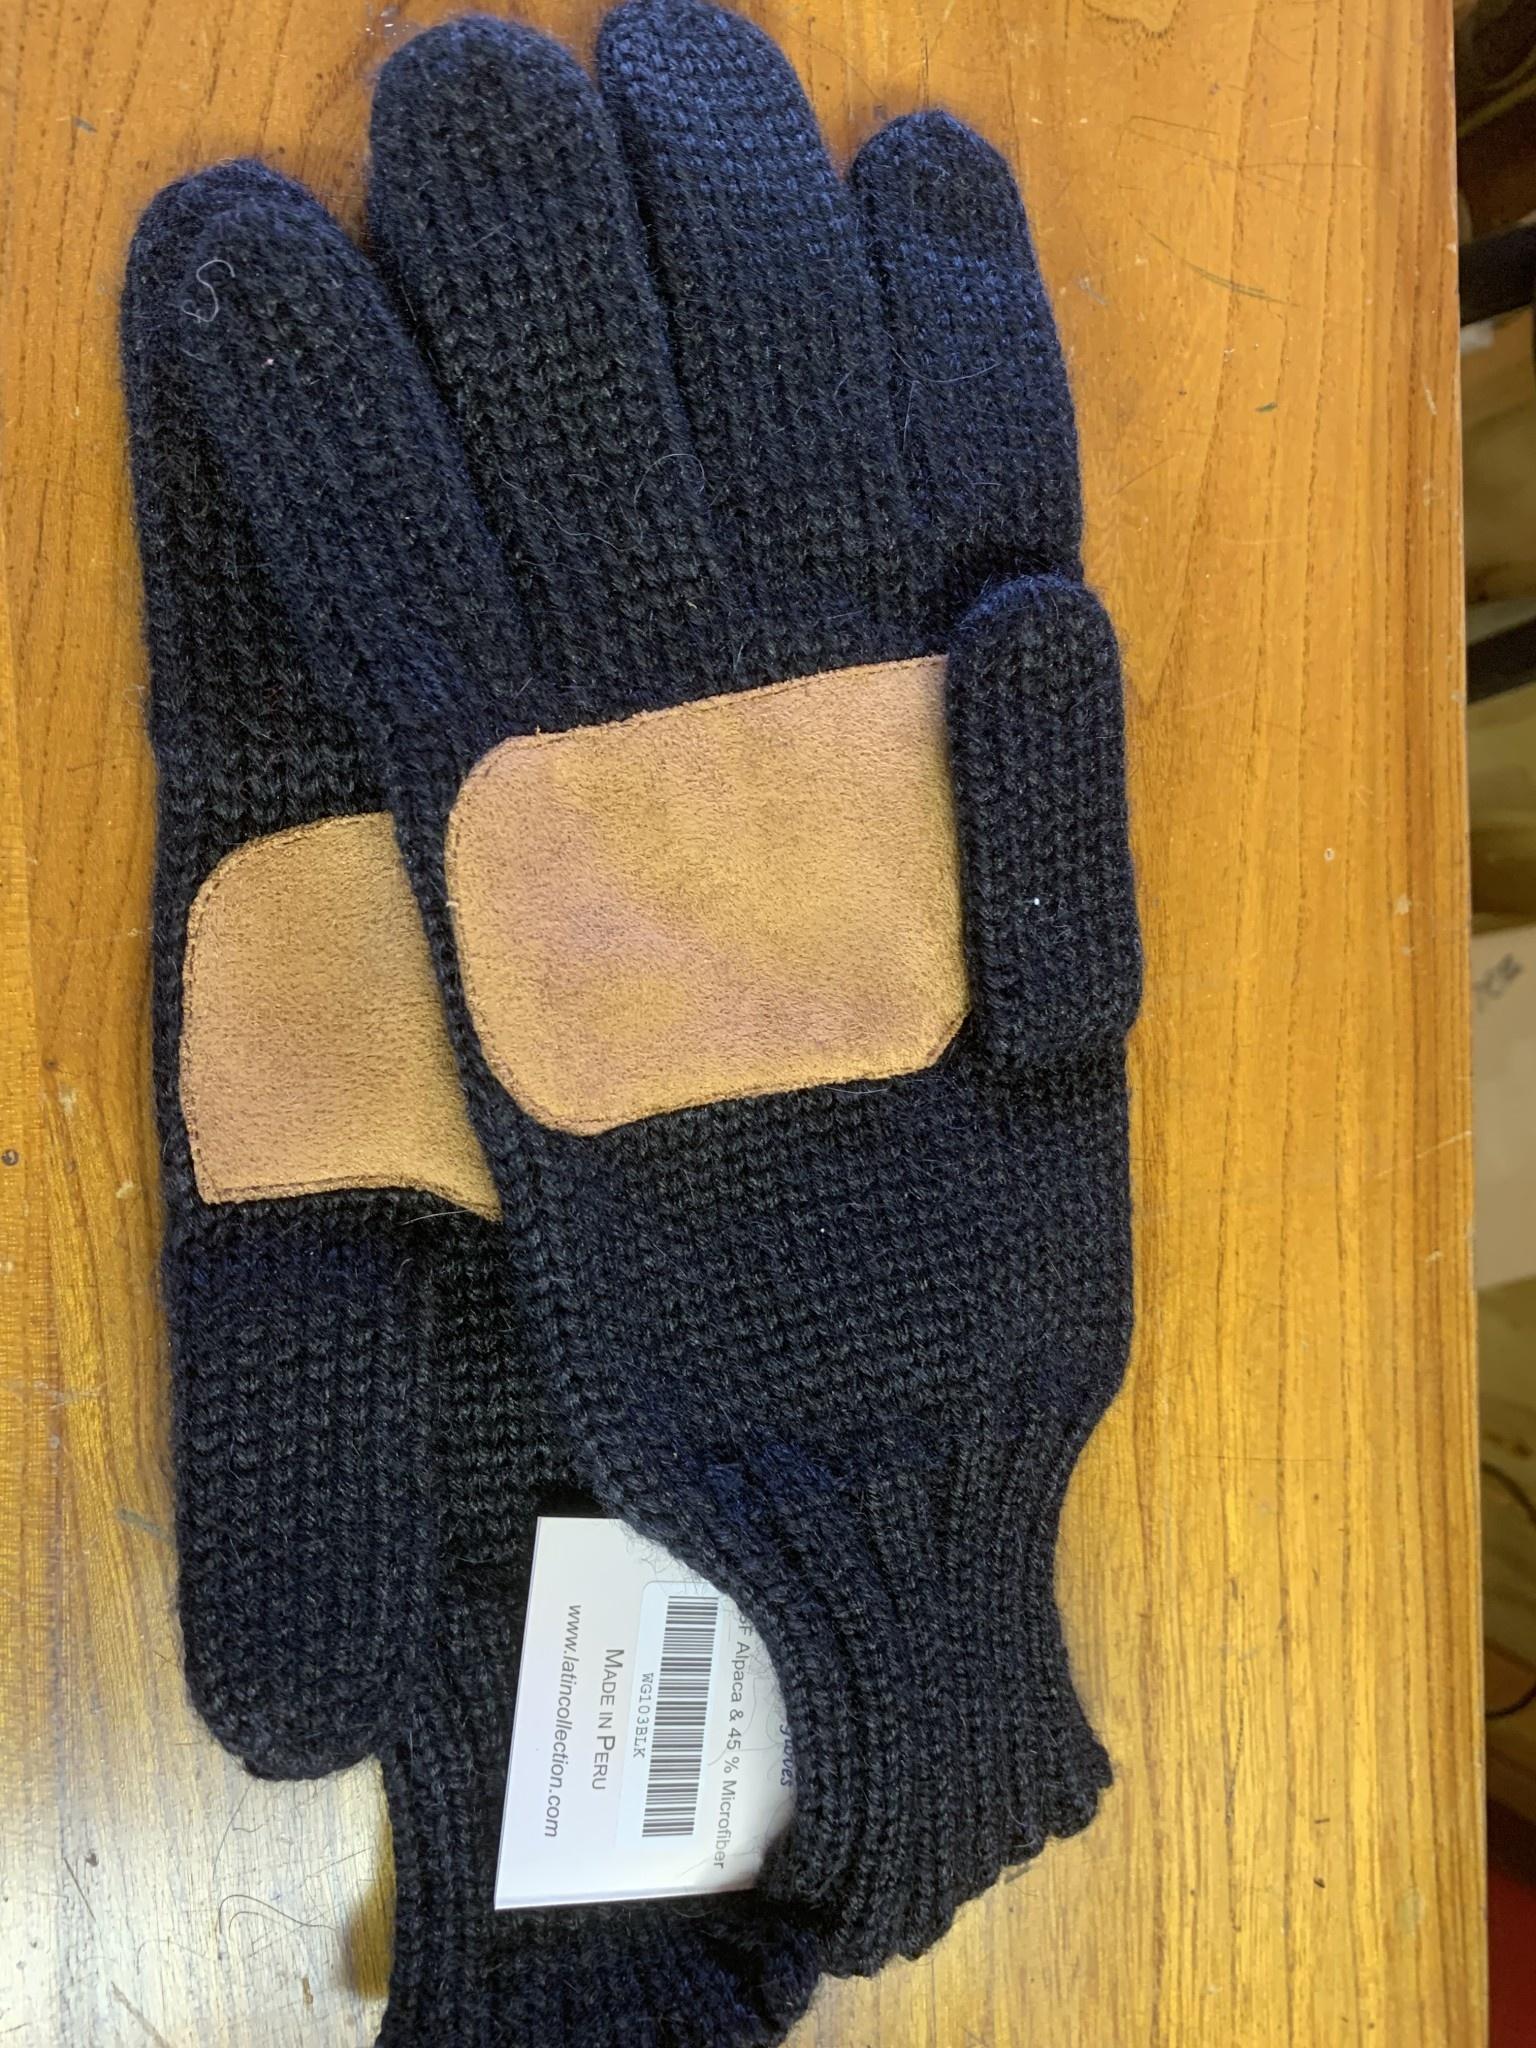 Alpaca Exchange Alpaca Gloves, Leather palm, CAmel or Black M/LG